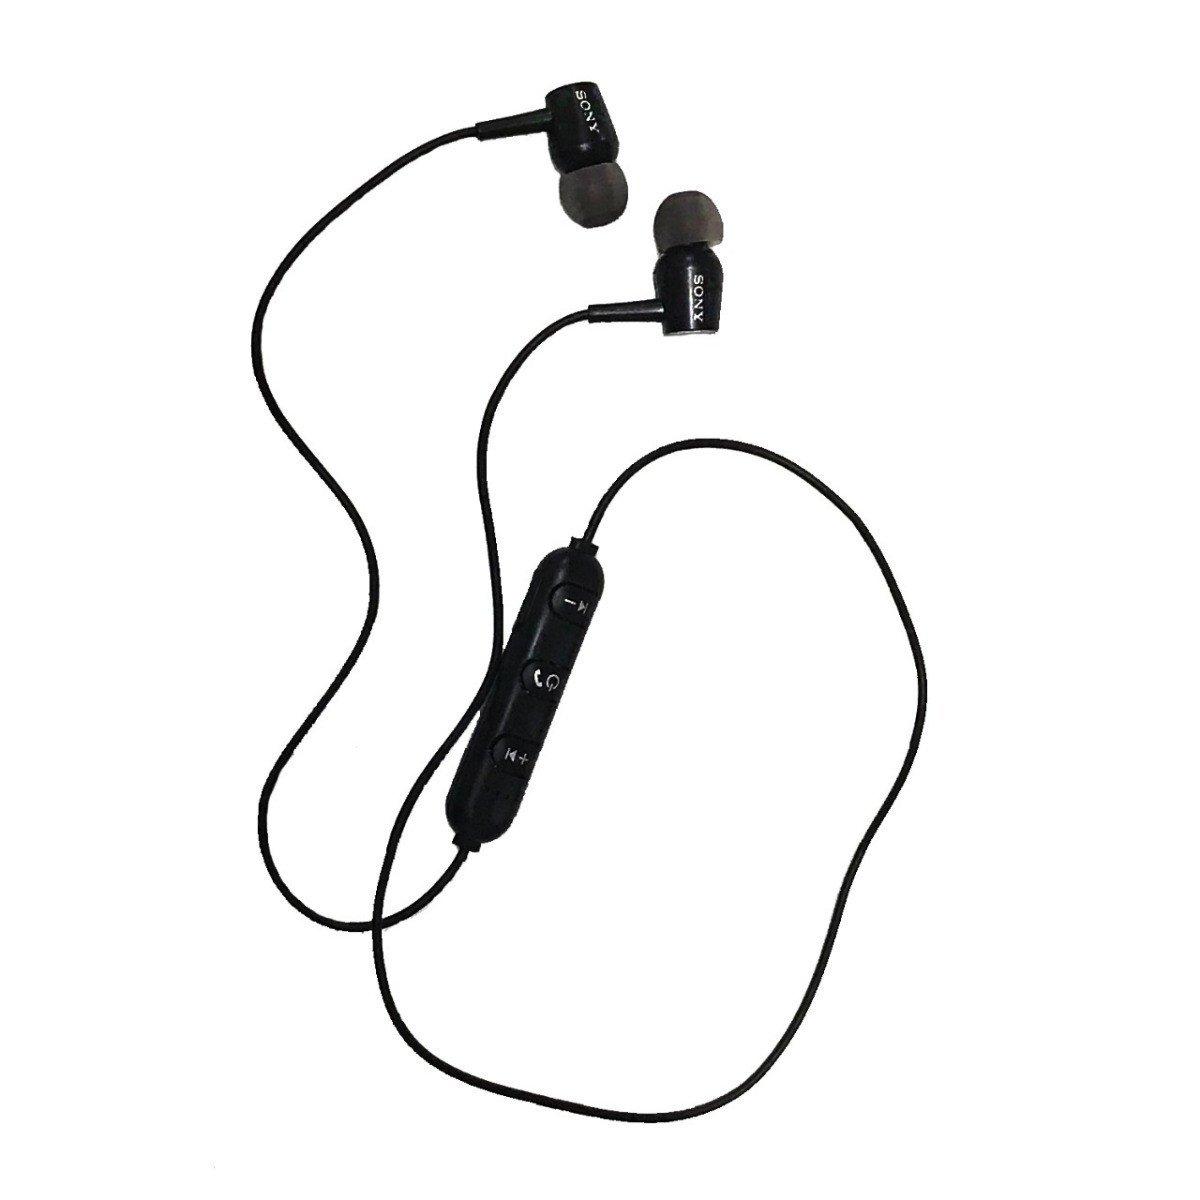 Sony Bluetooth Earphone Mh 750 Mddex Online Store Headset Mh750 Model